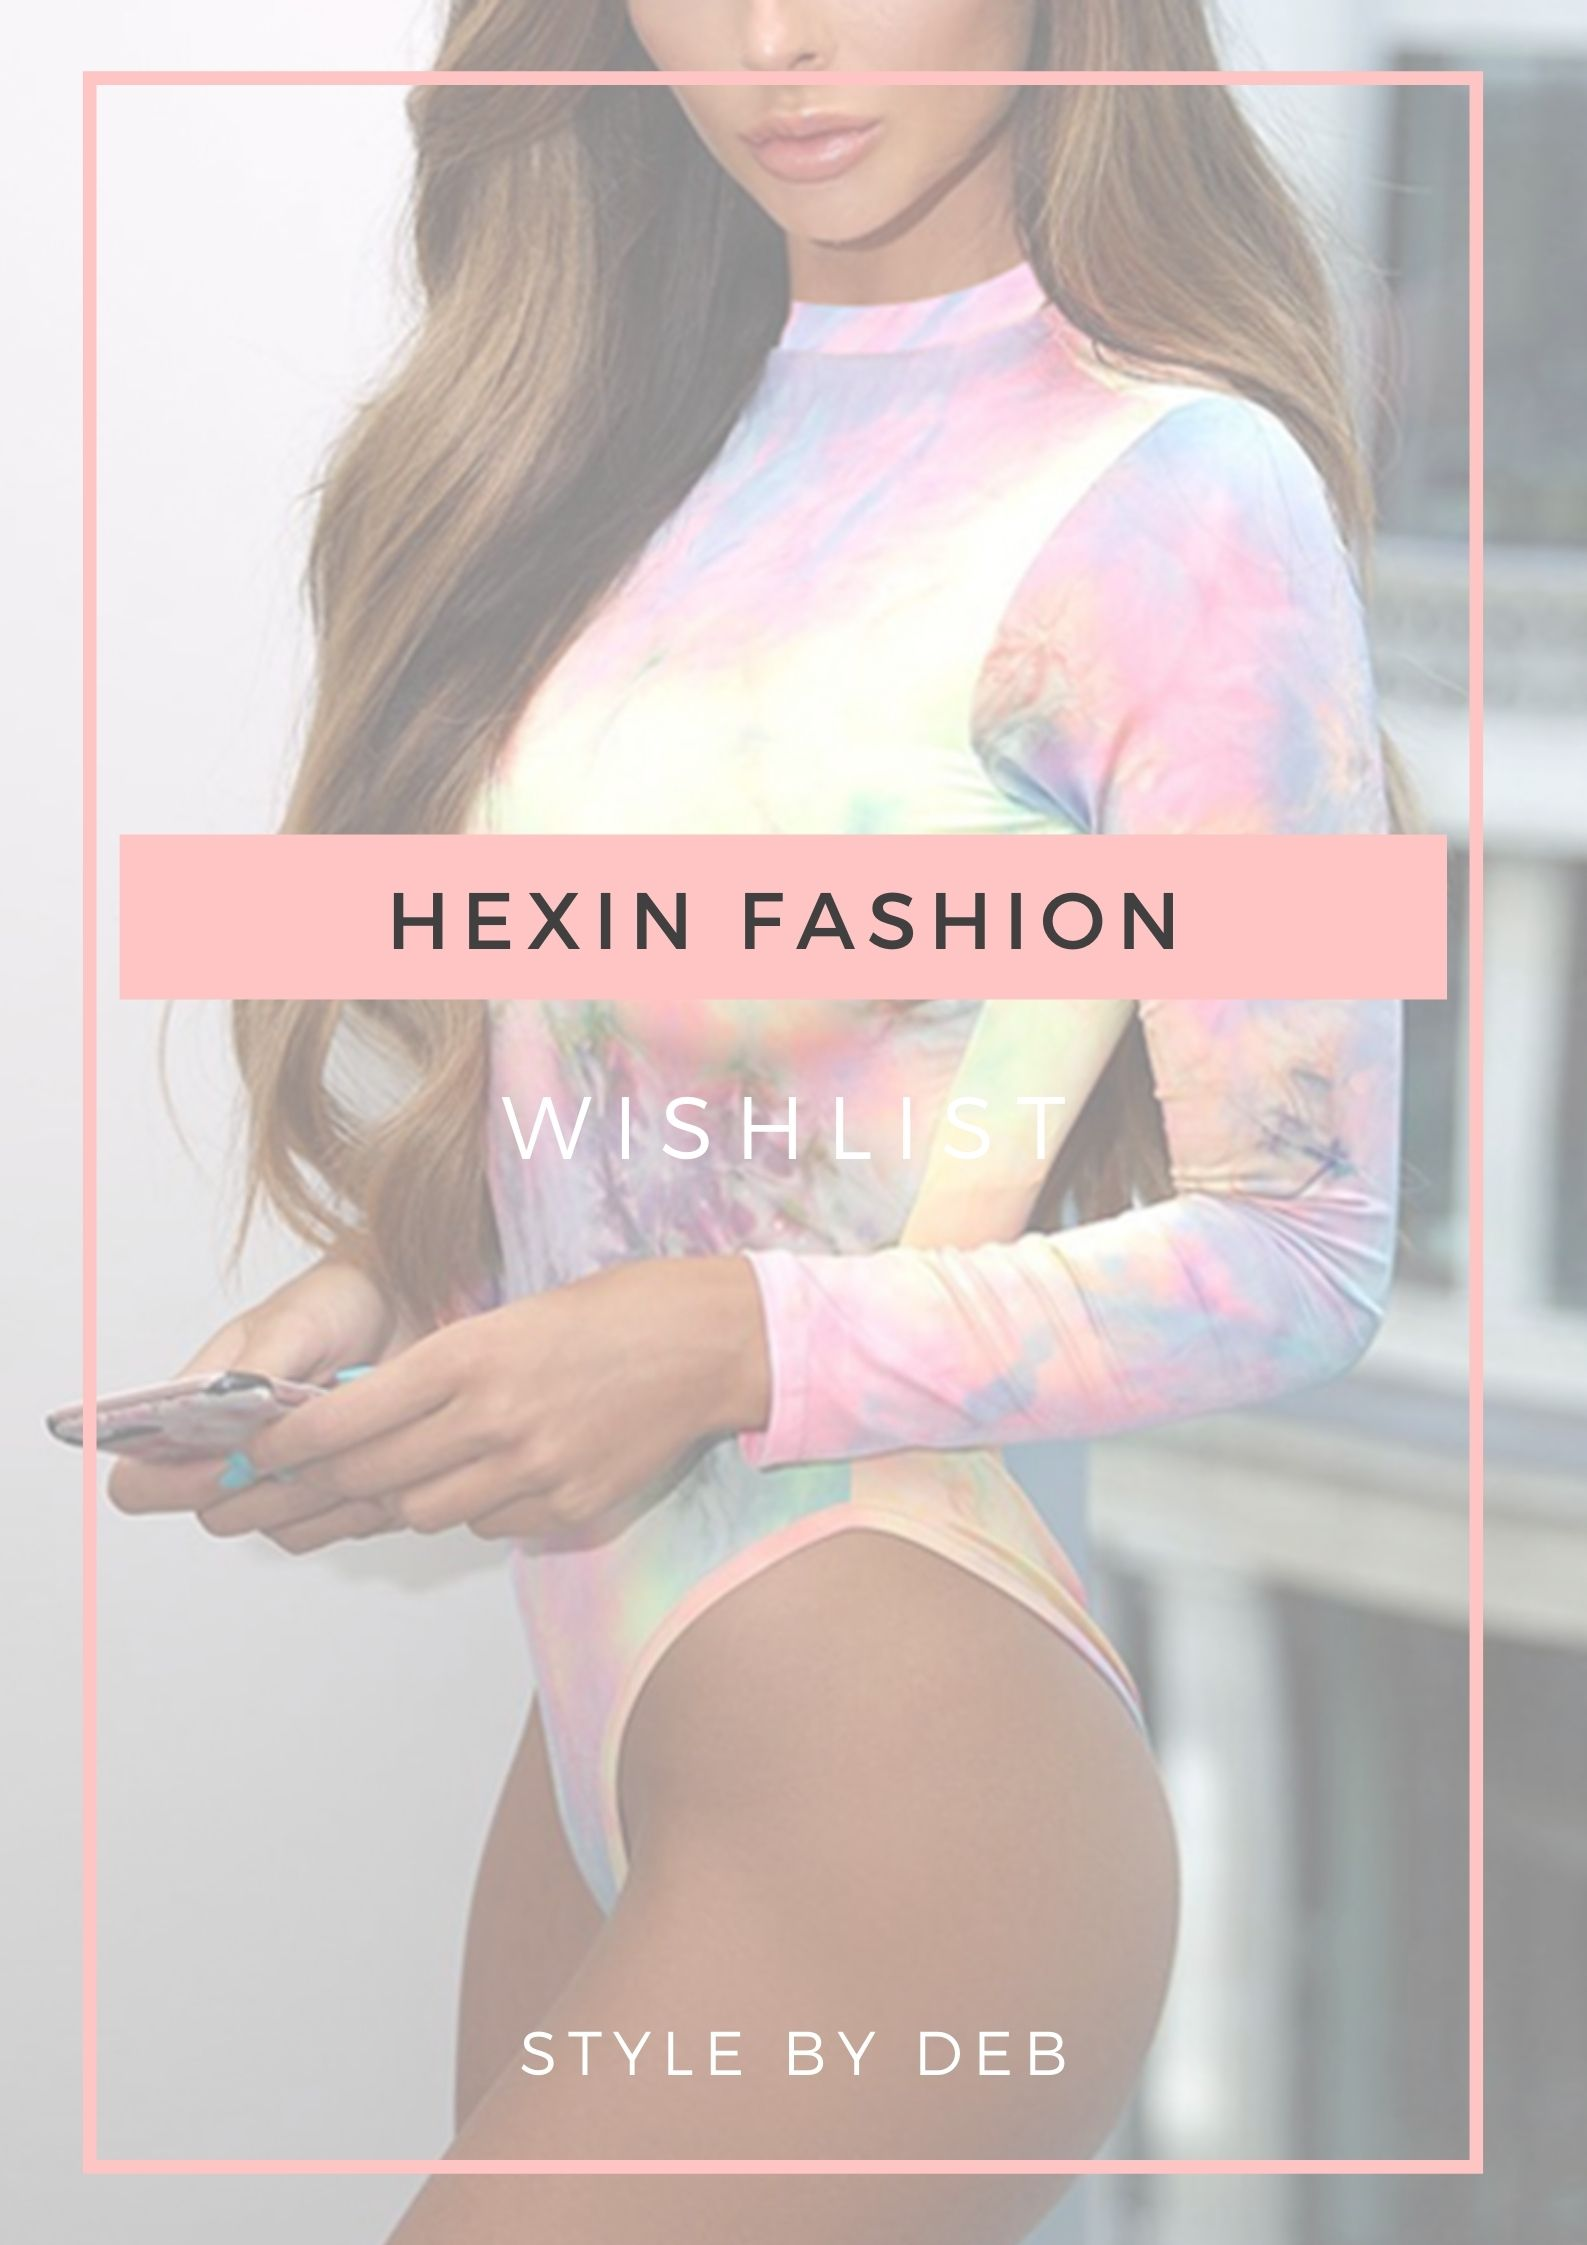 My Hexin Fashion wishlist